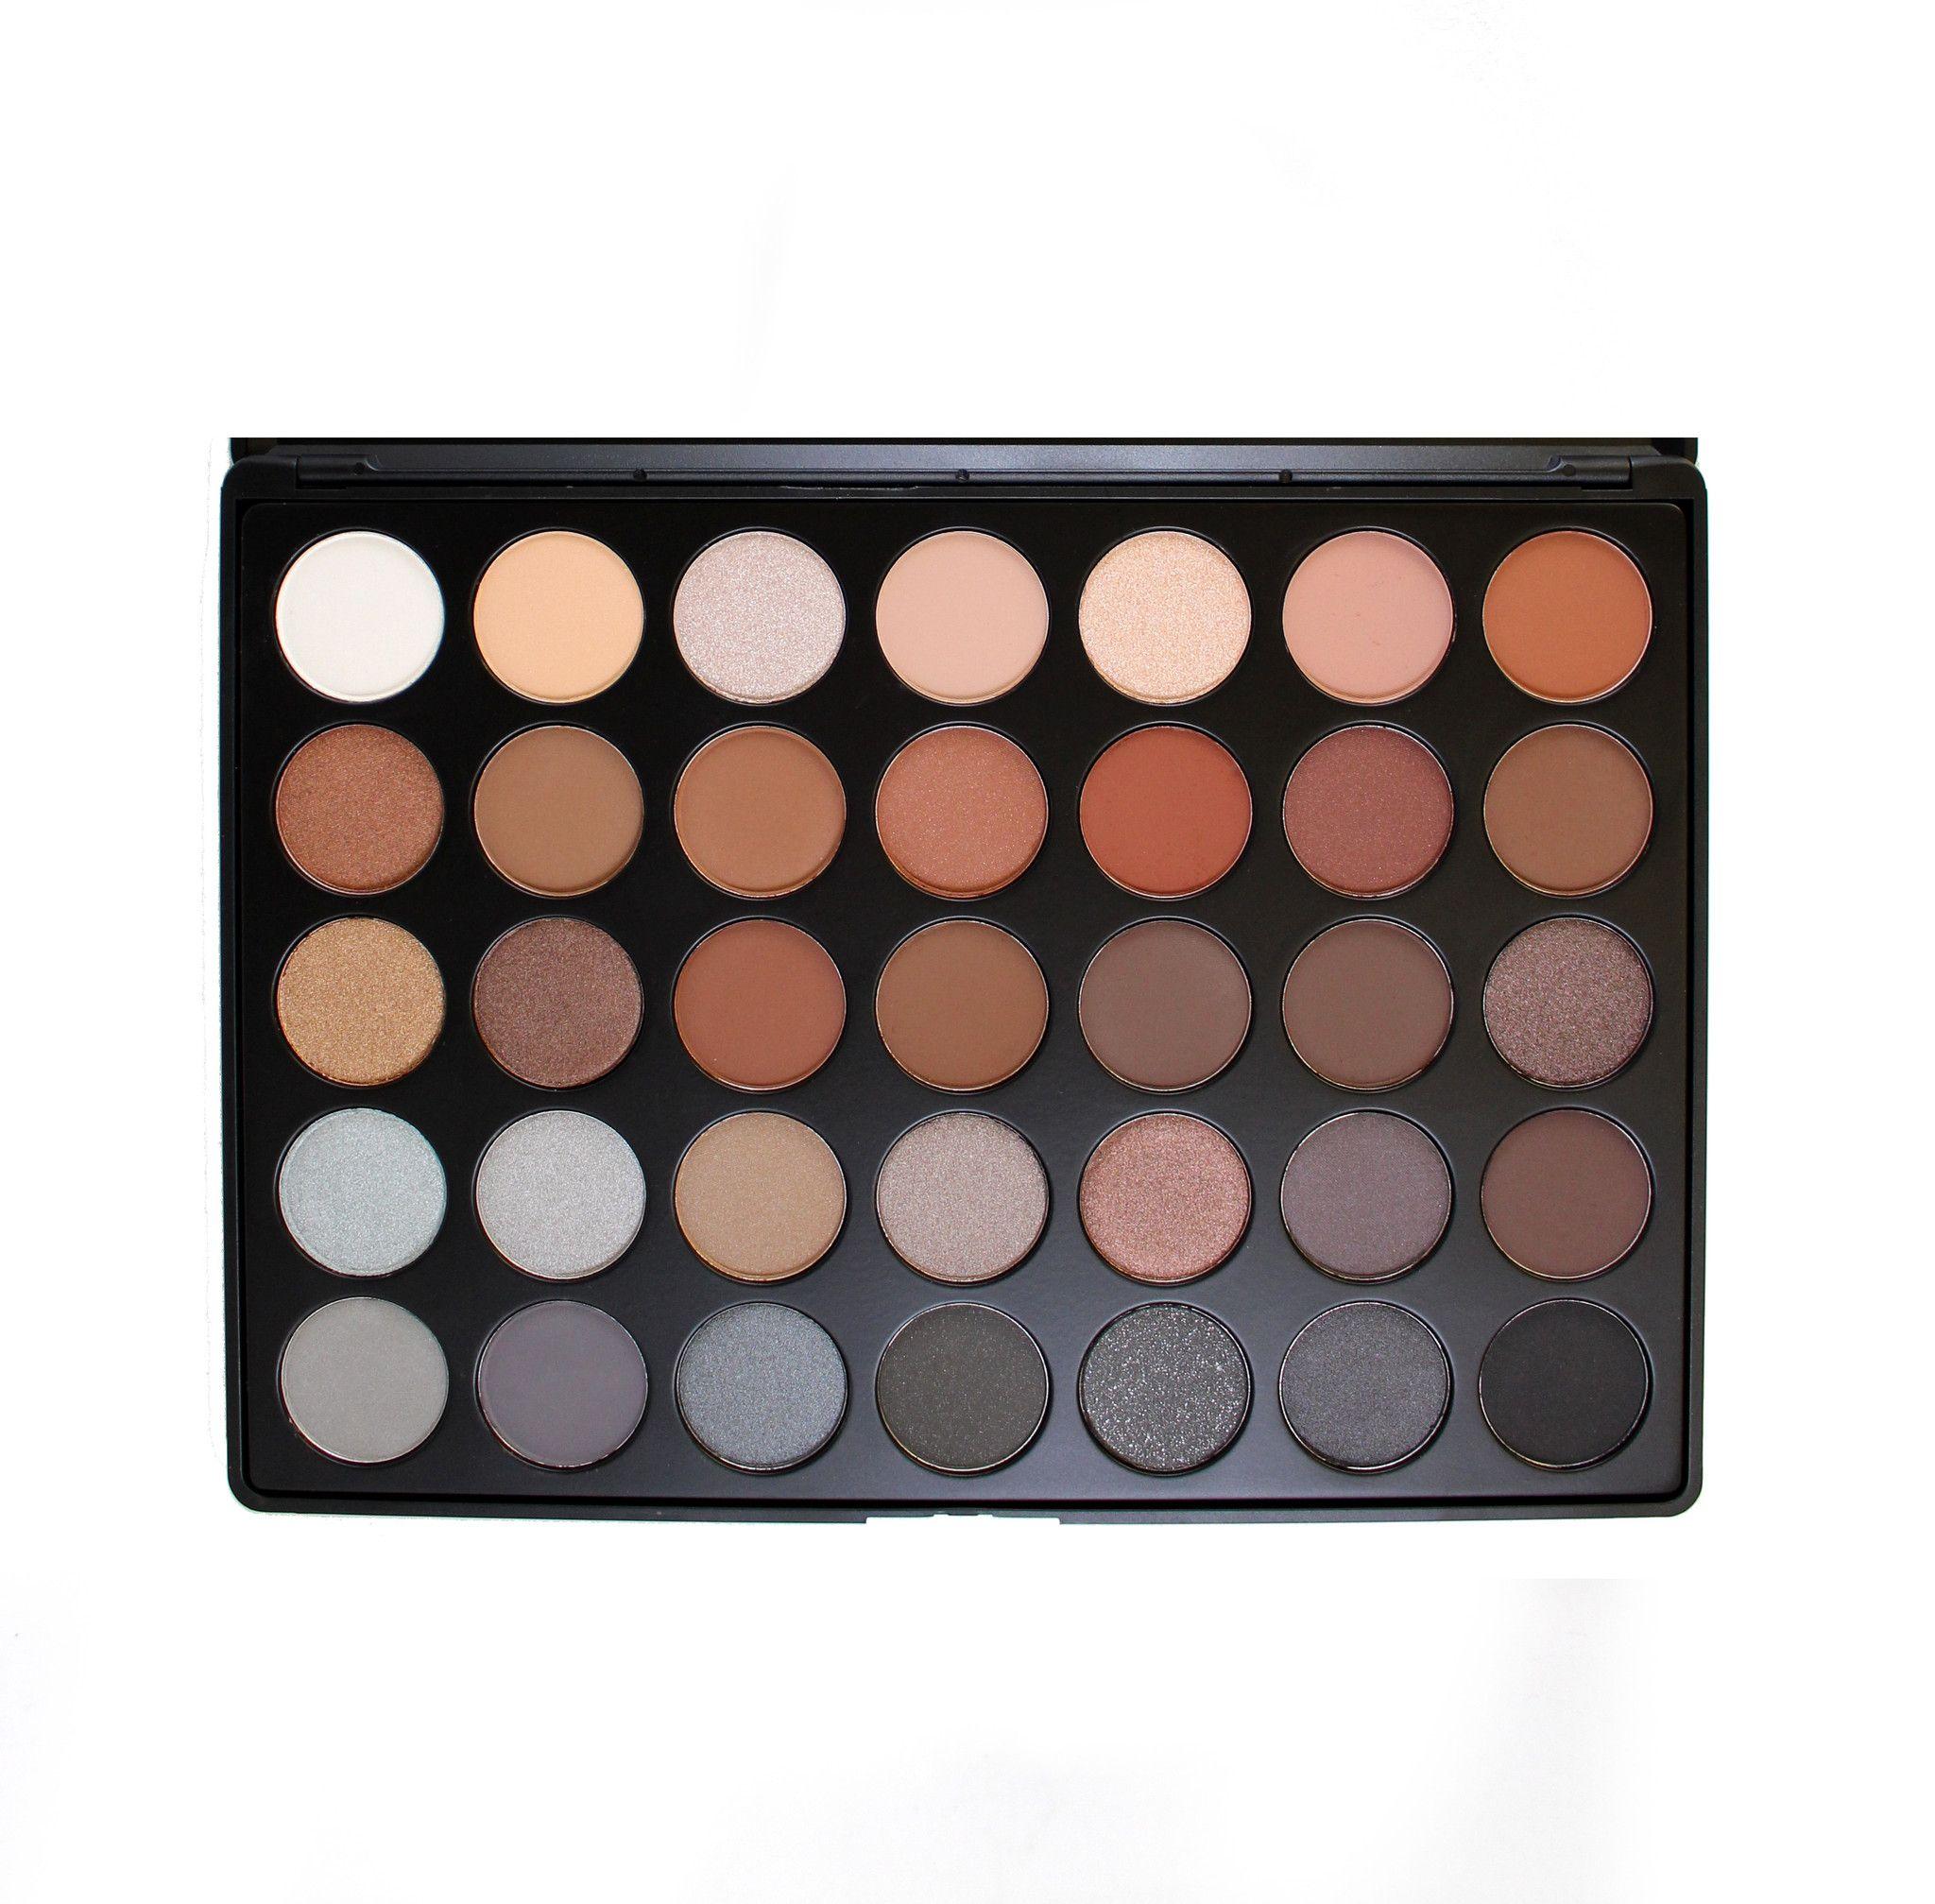 Morphe 35k eyeshadow palette review beauty in bold - Morphe 35 K Palette